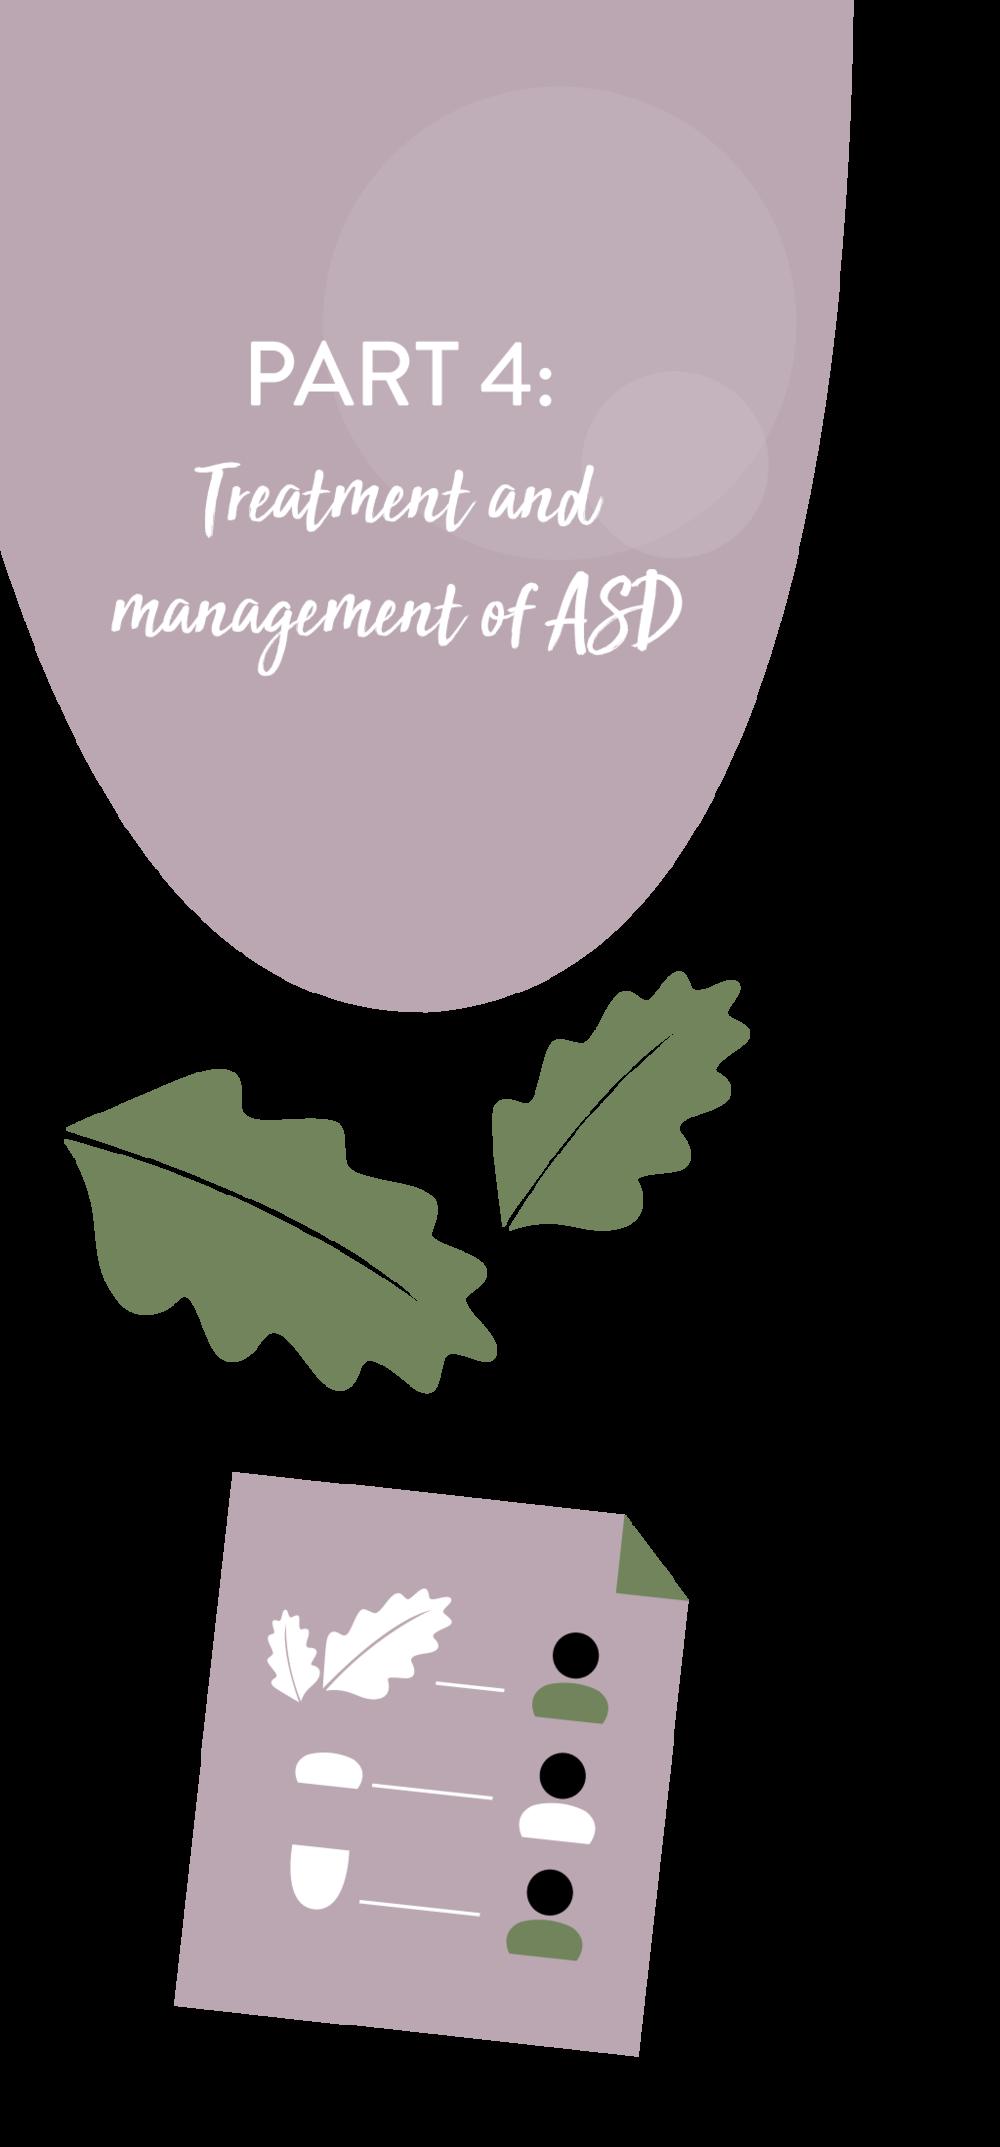 Acorn-Autism-Auckland-Infographic-Part4_autism_therapy_services.png